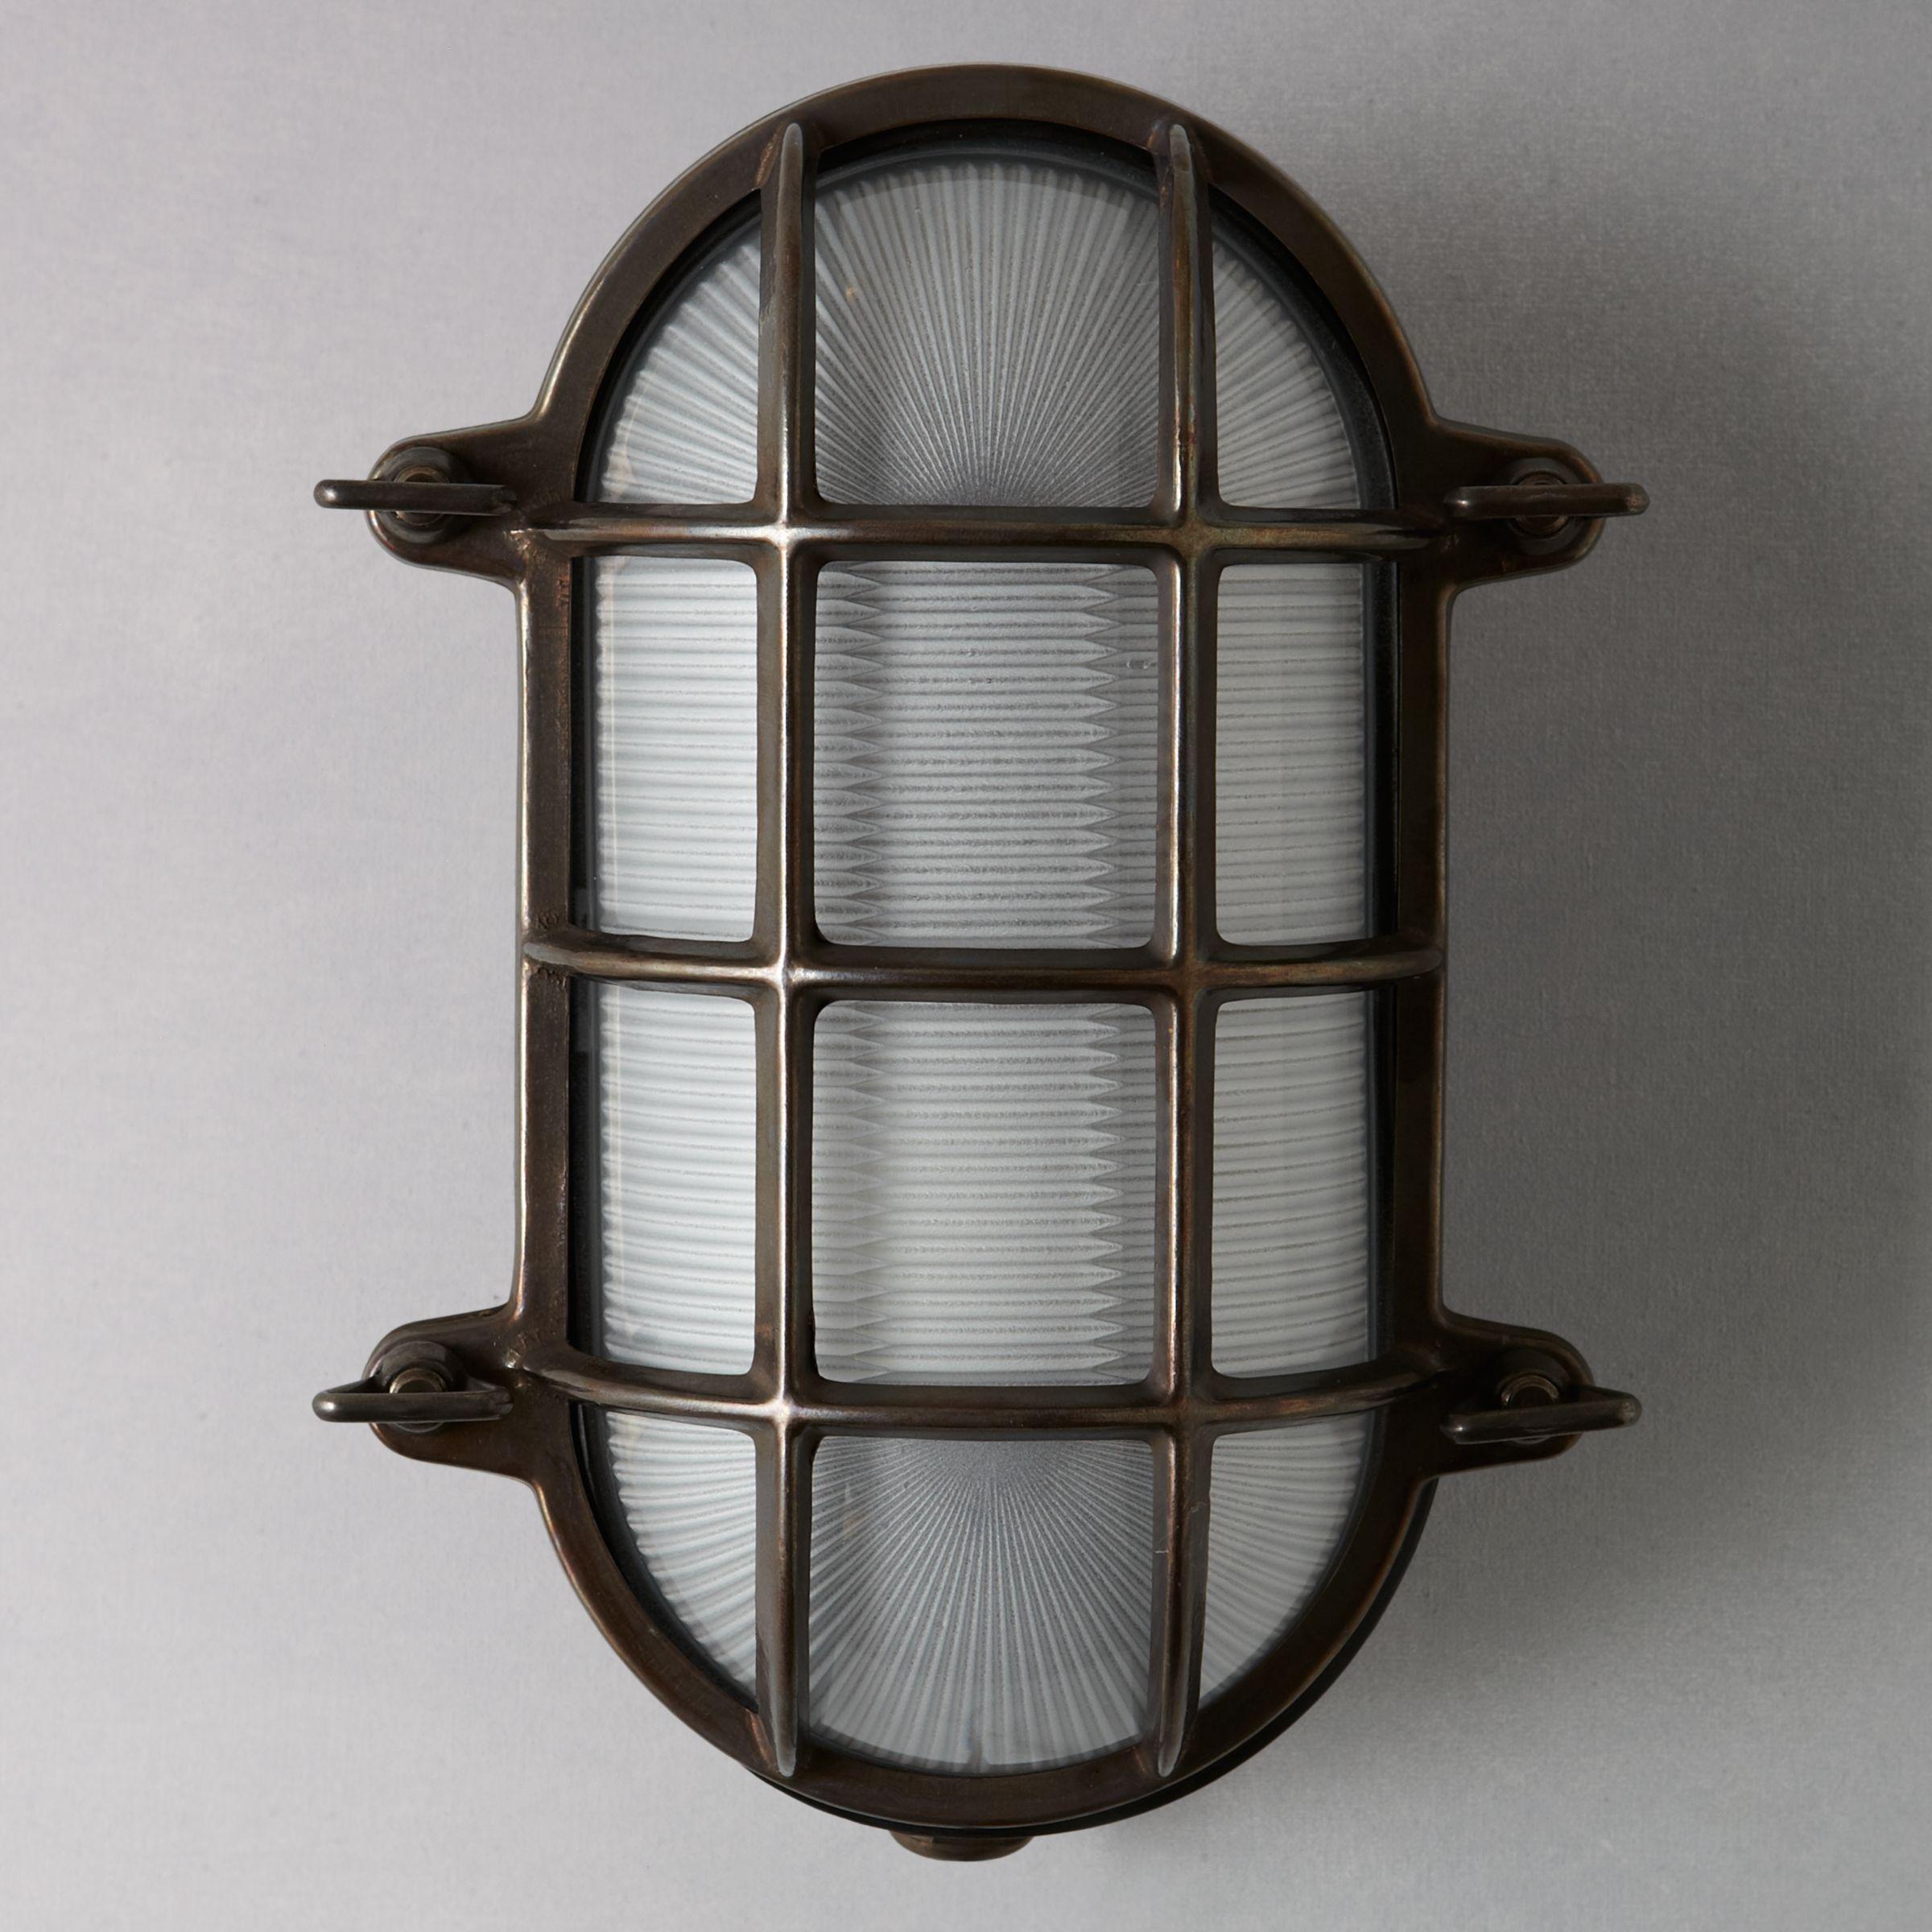 Bulkhead Ceiling LightMarine Bulkhead WallCeiling Light With